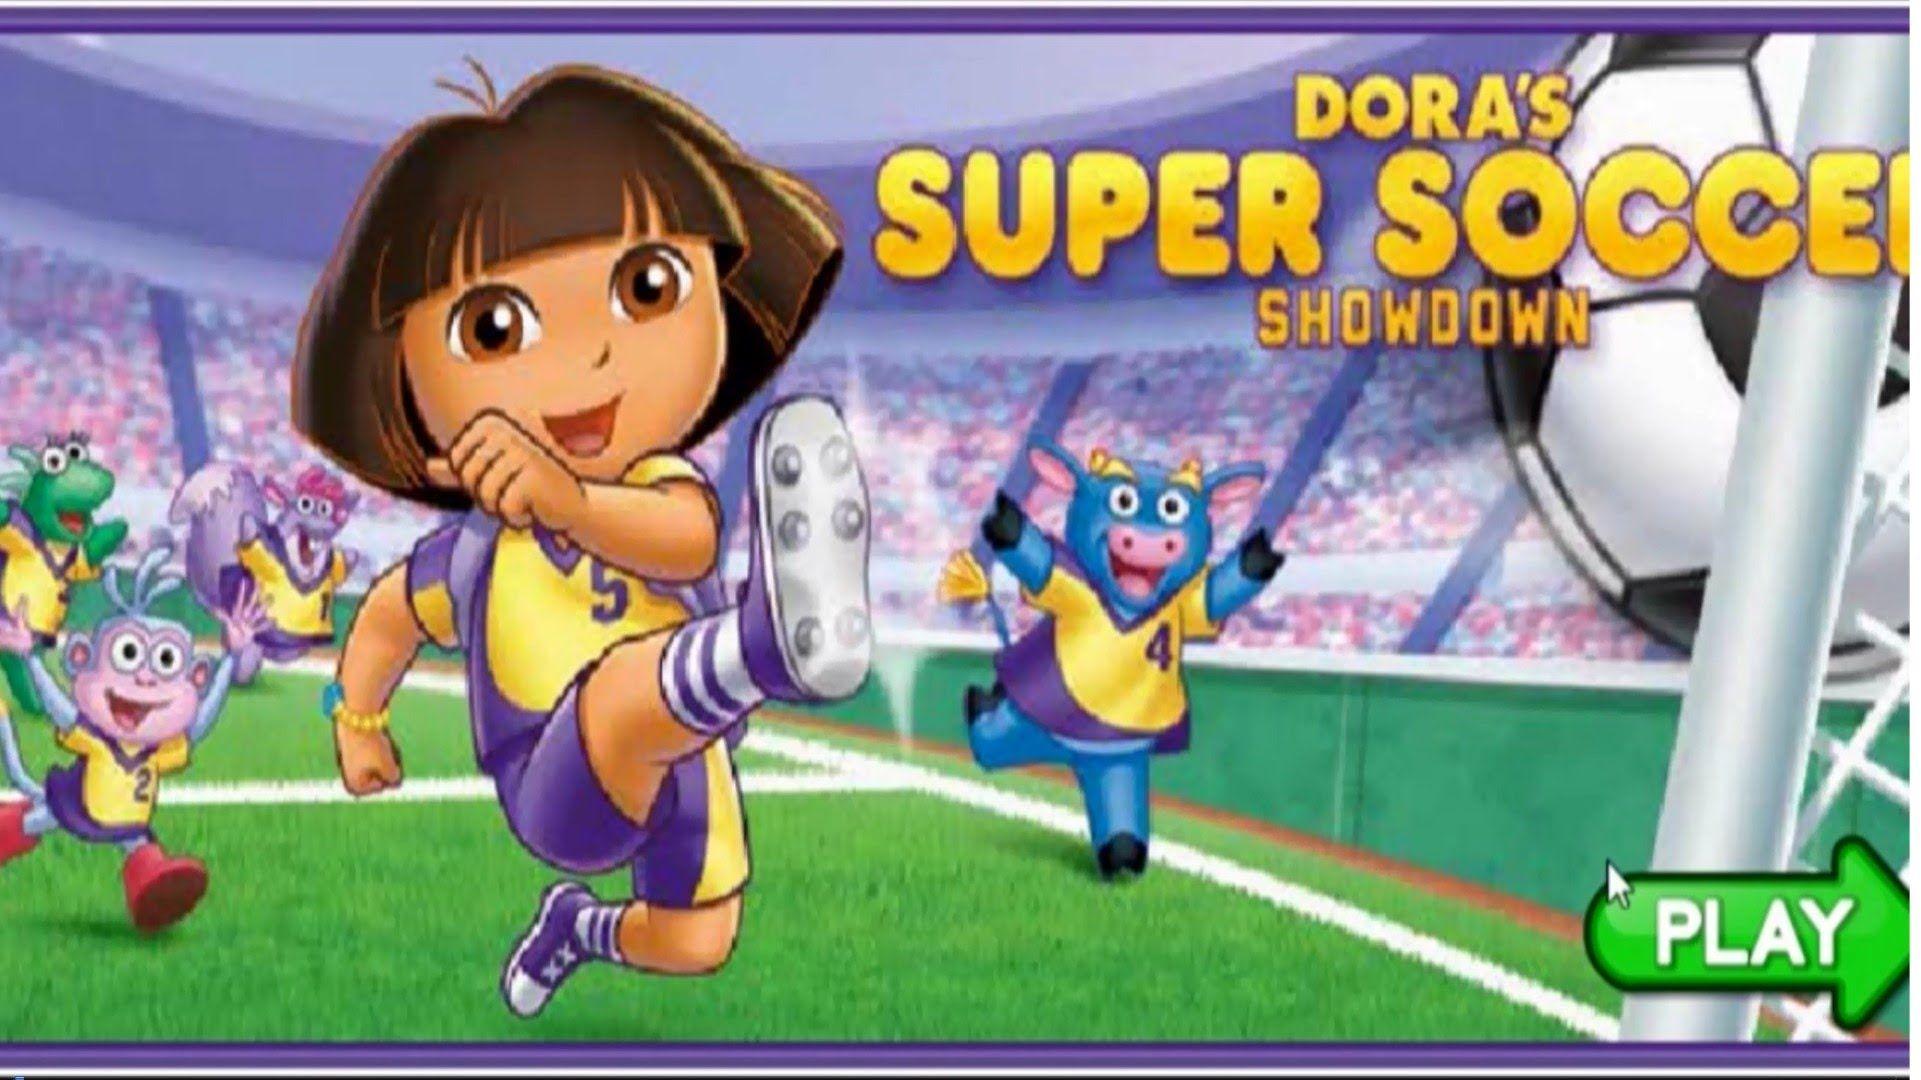 Games For Kids Video Games Dora's Super Soccer Showdown